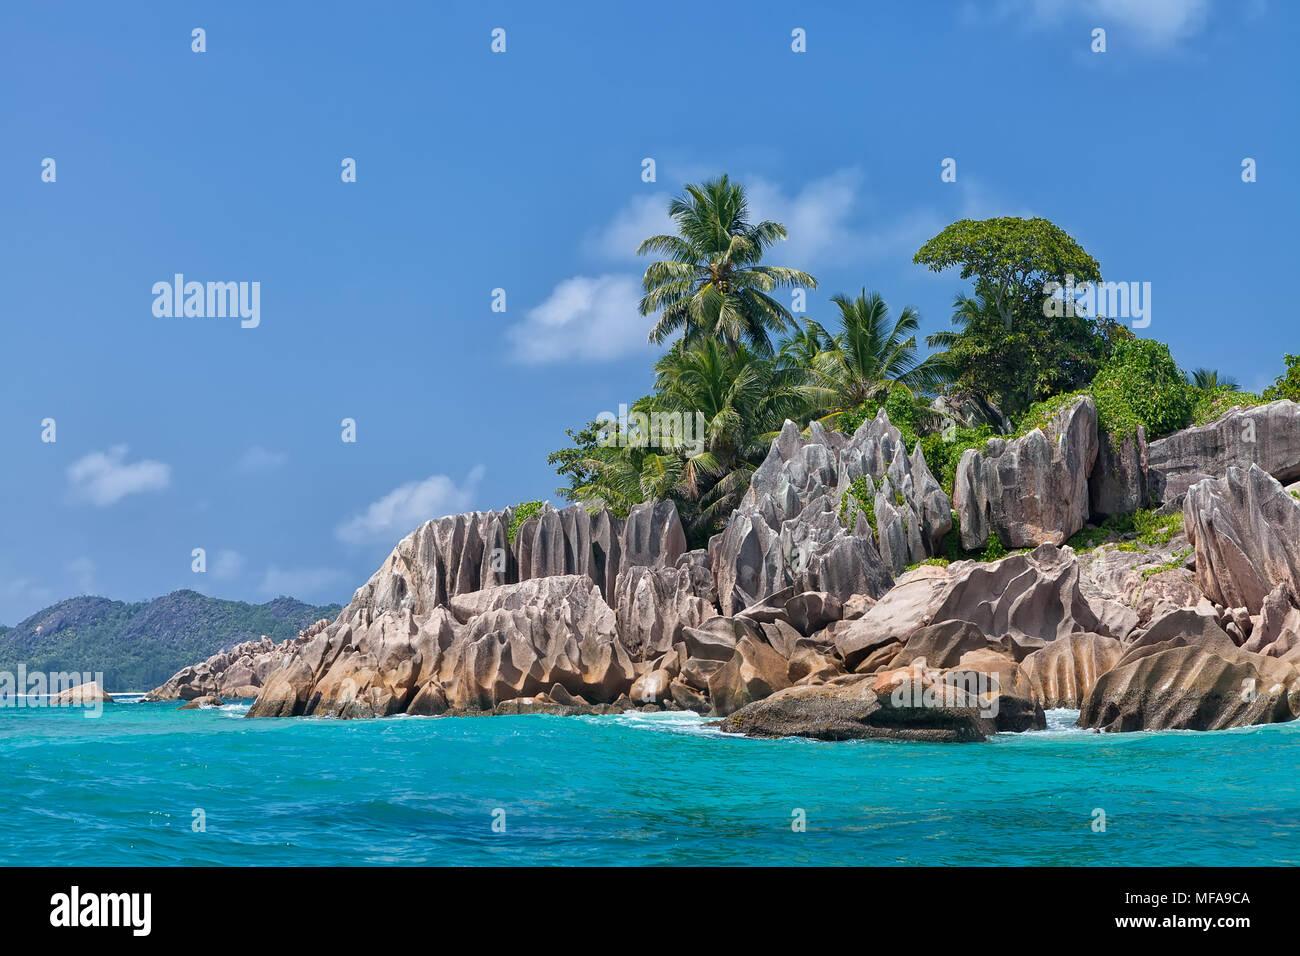 Beautiful tropical St. Pierre Island, Seychelles - Stock Image